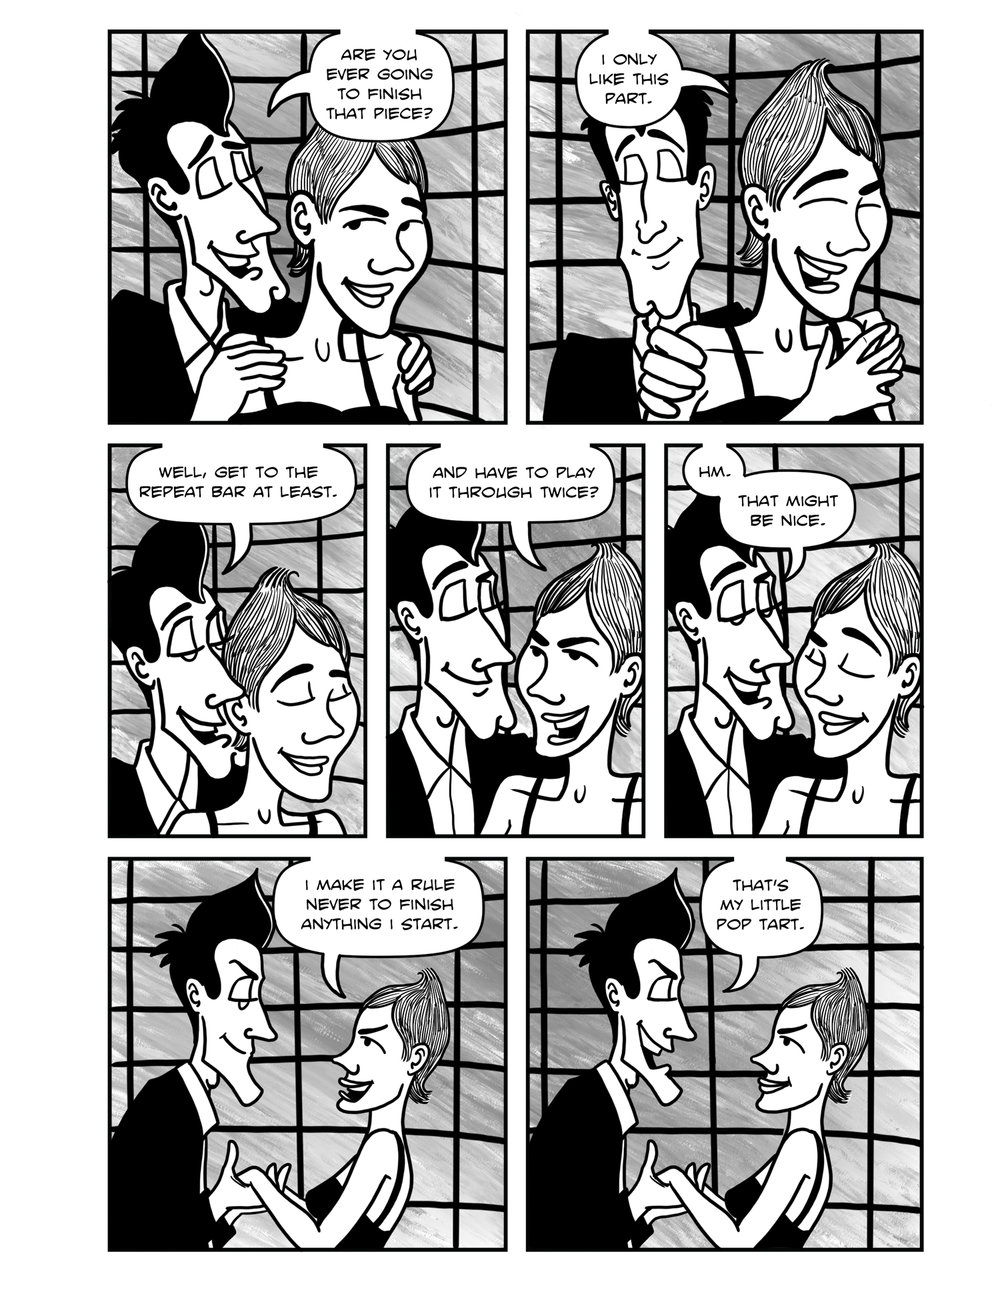 PAGE-290.jpg